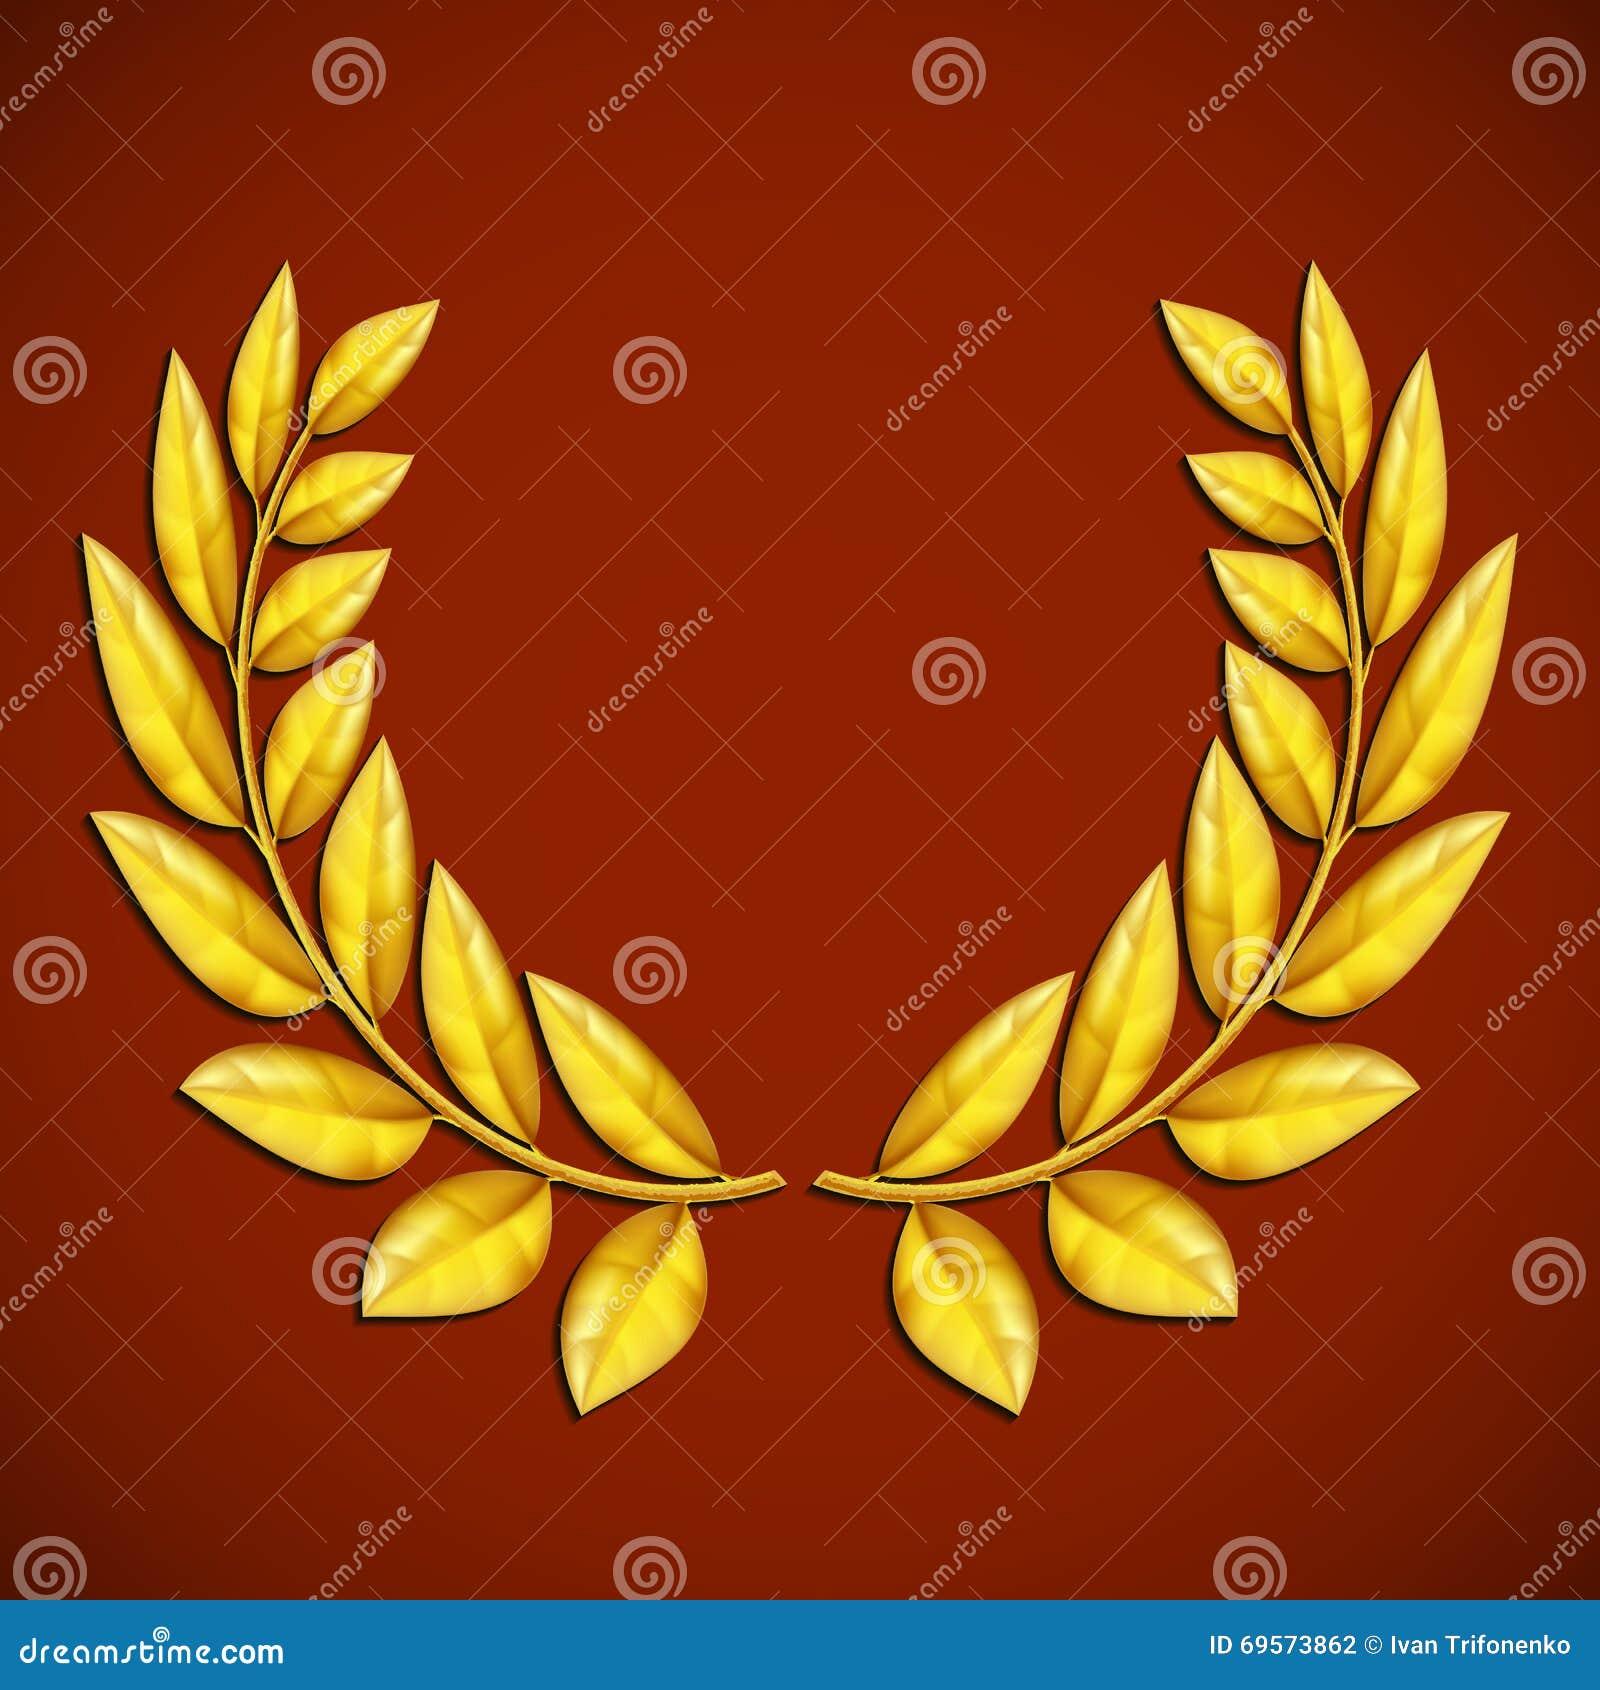 Golden Olive Wreath Symbol Of Victory Award Winner Stock Vect